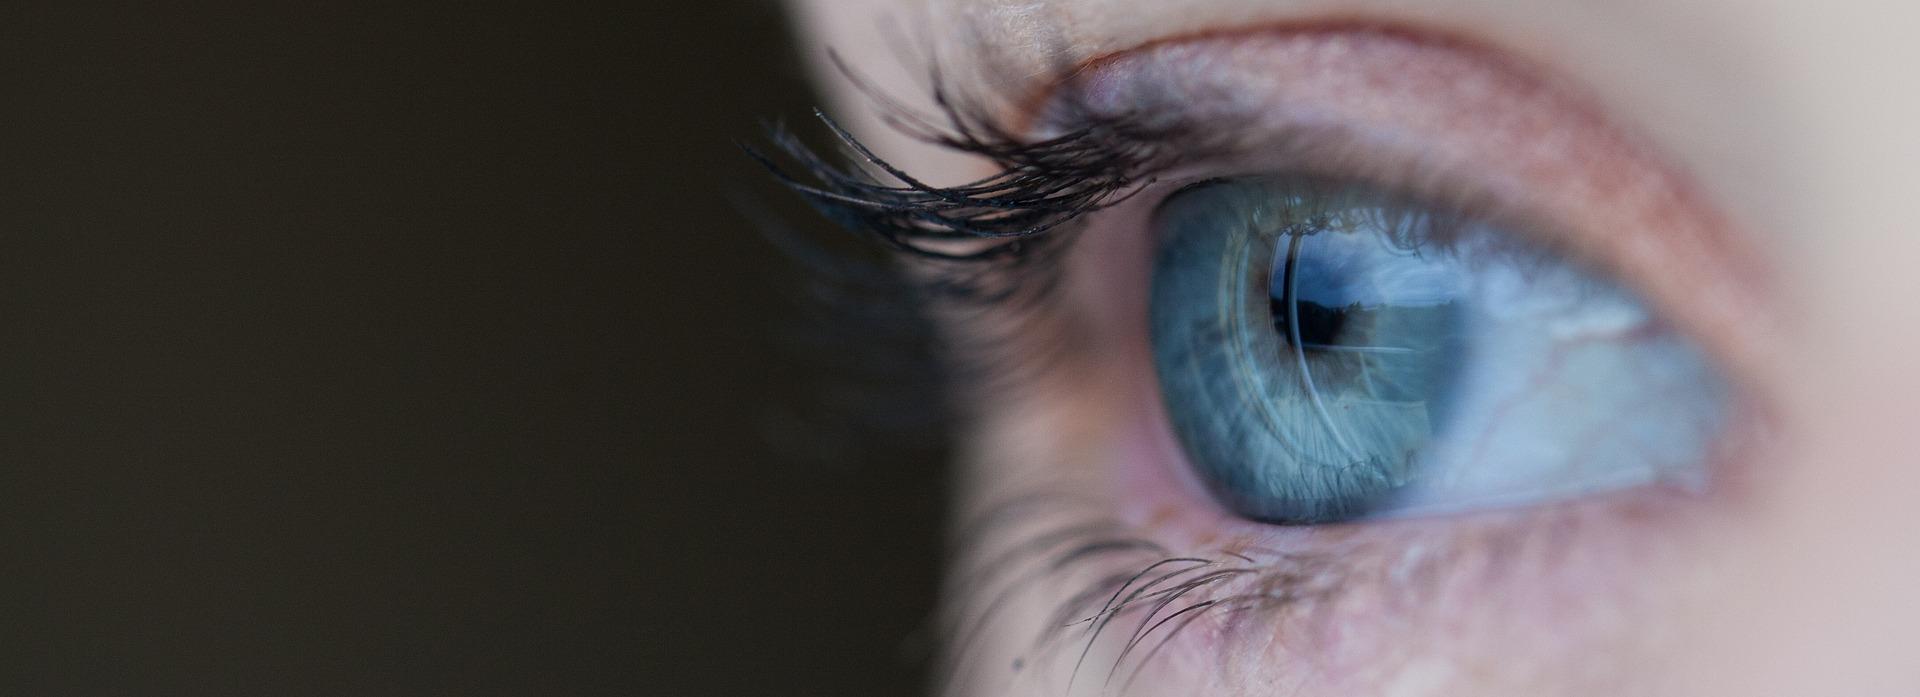 Ojo con la retinosis pigmentaria